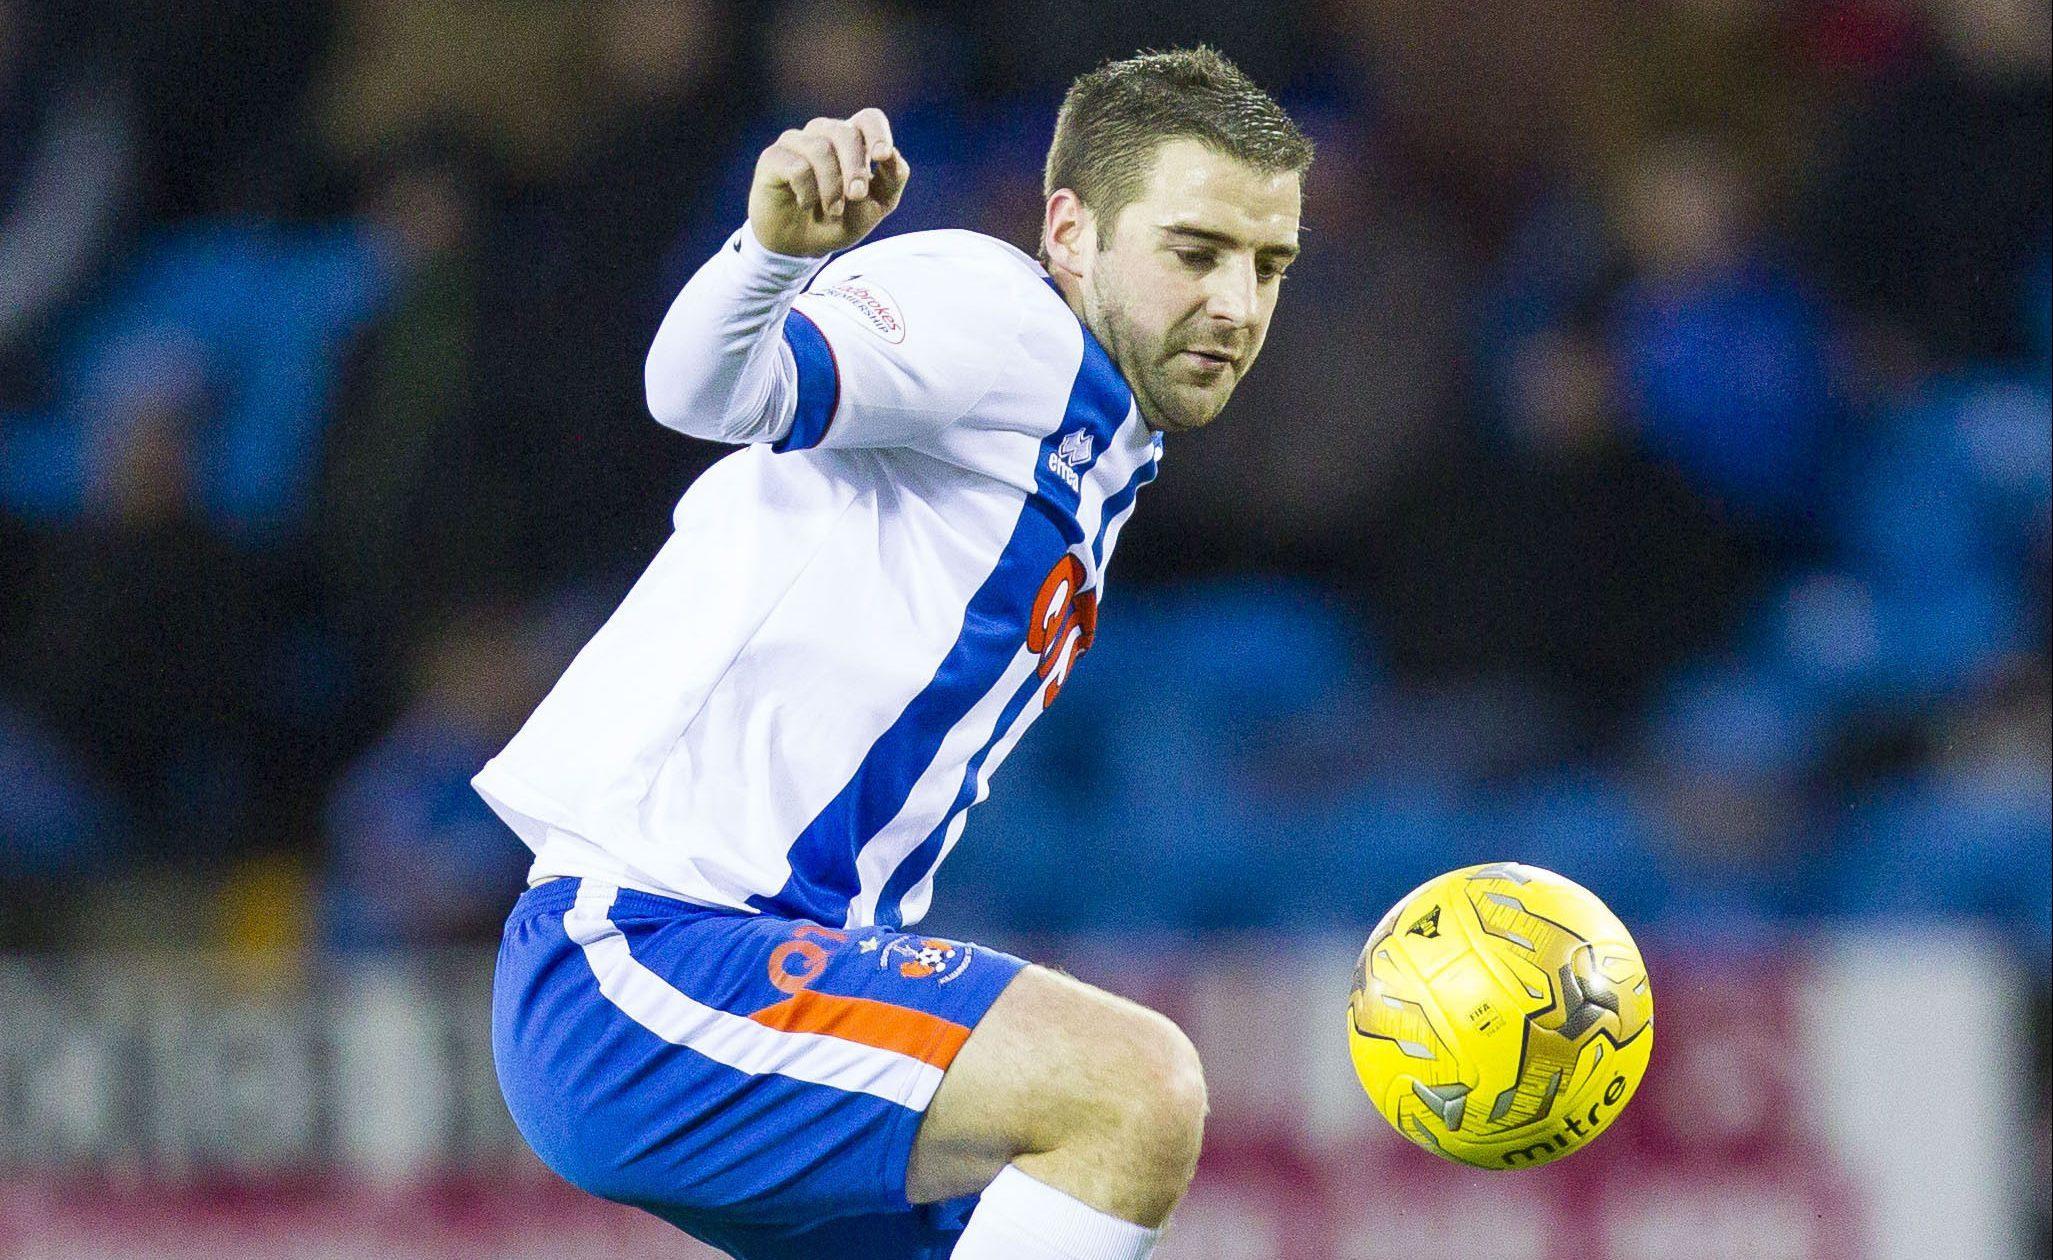 Scott Robinson in action for Kilmarnock